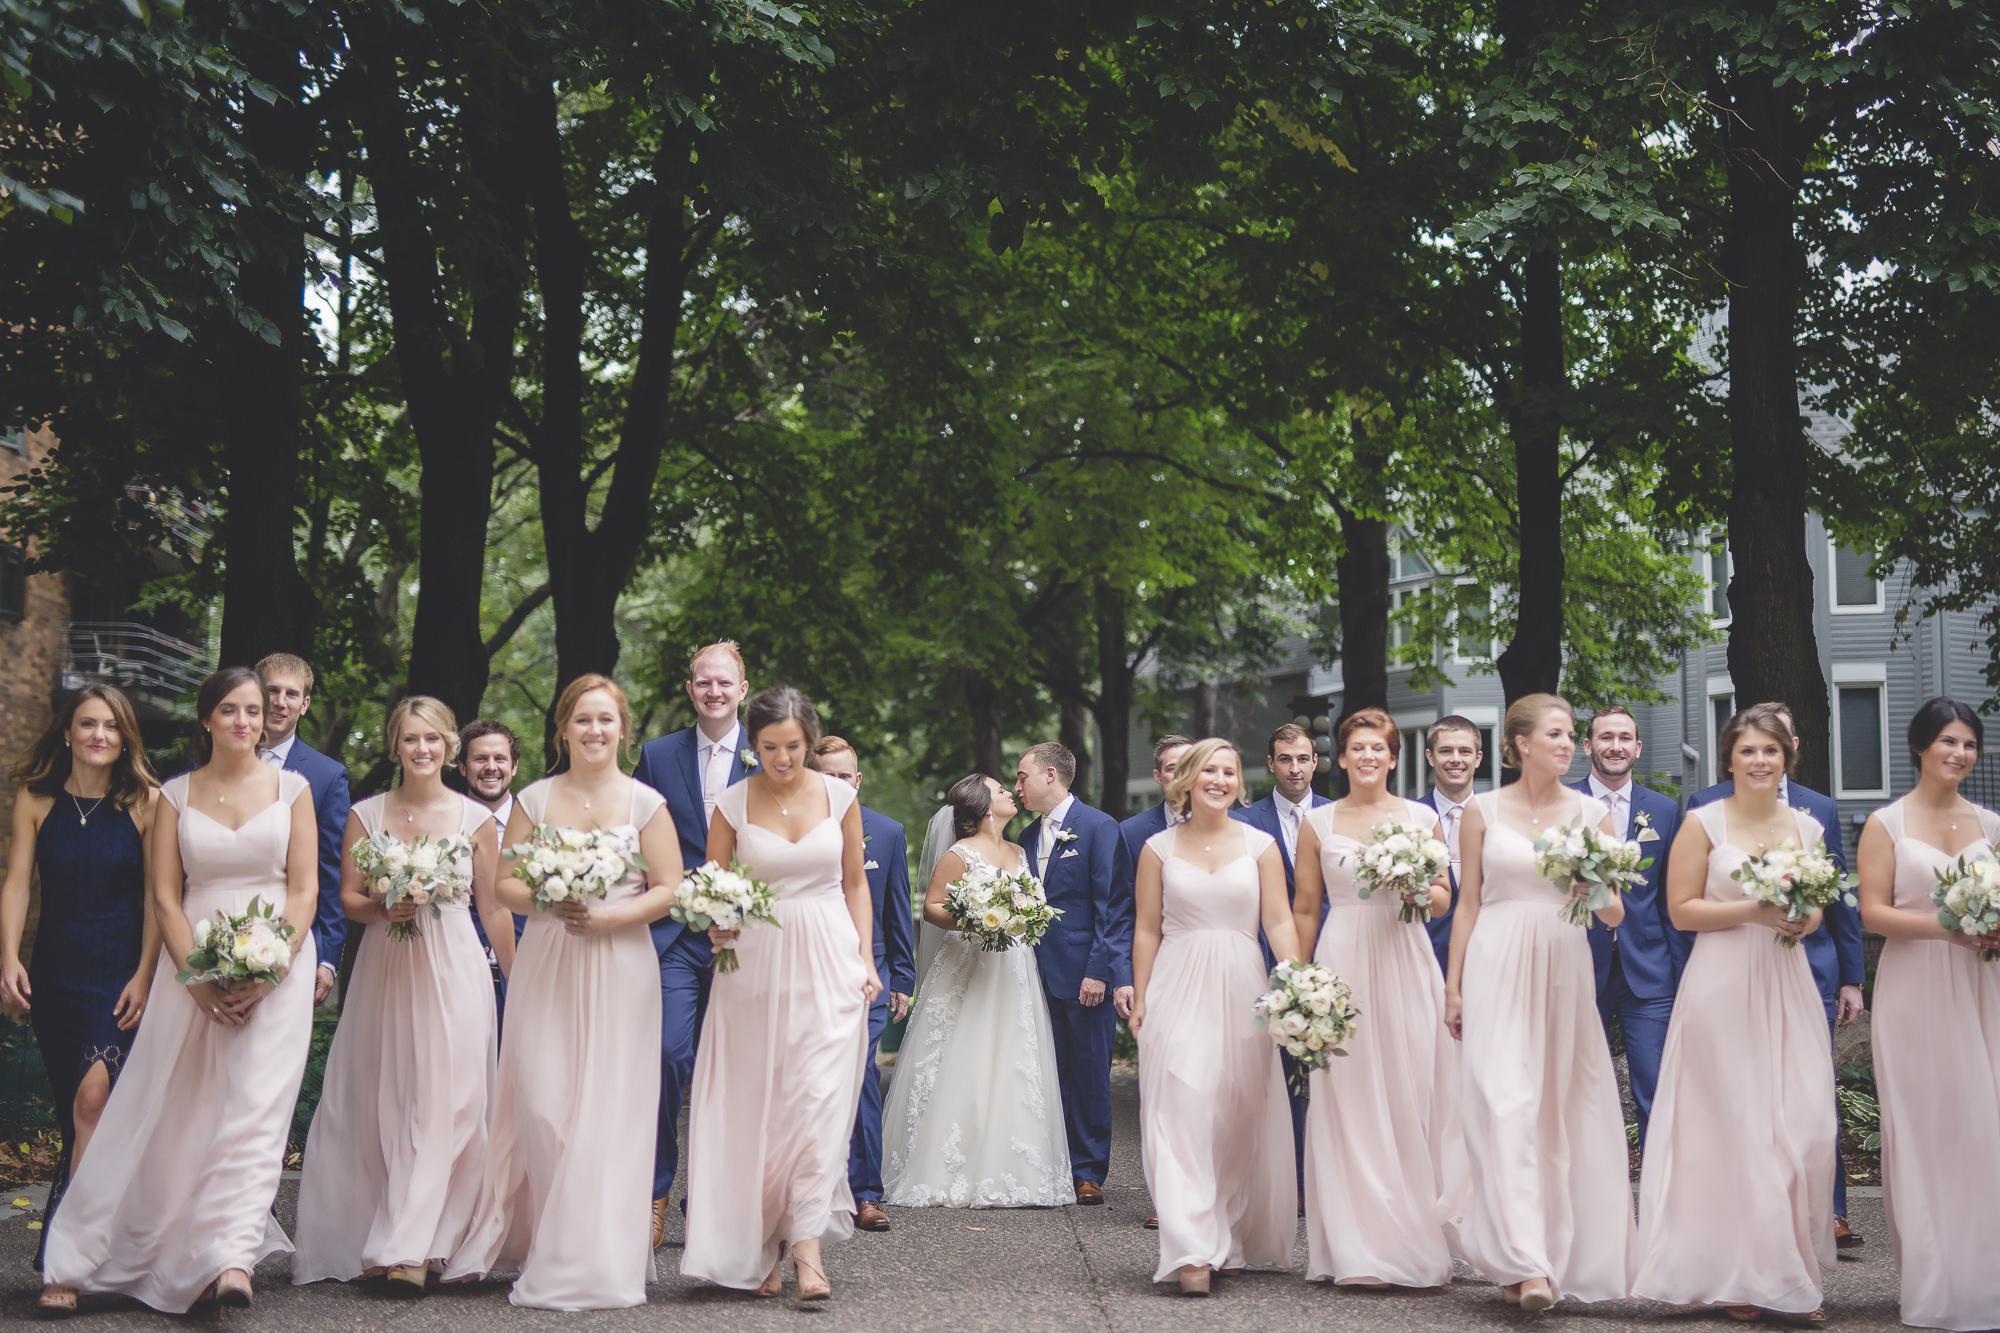 aria minneapolis wedding photography-21.jpg